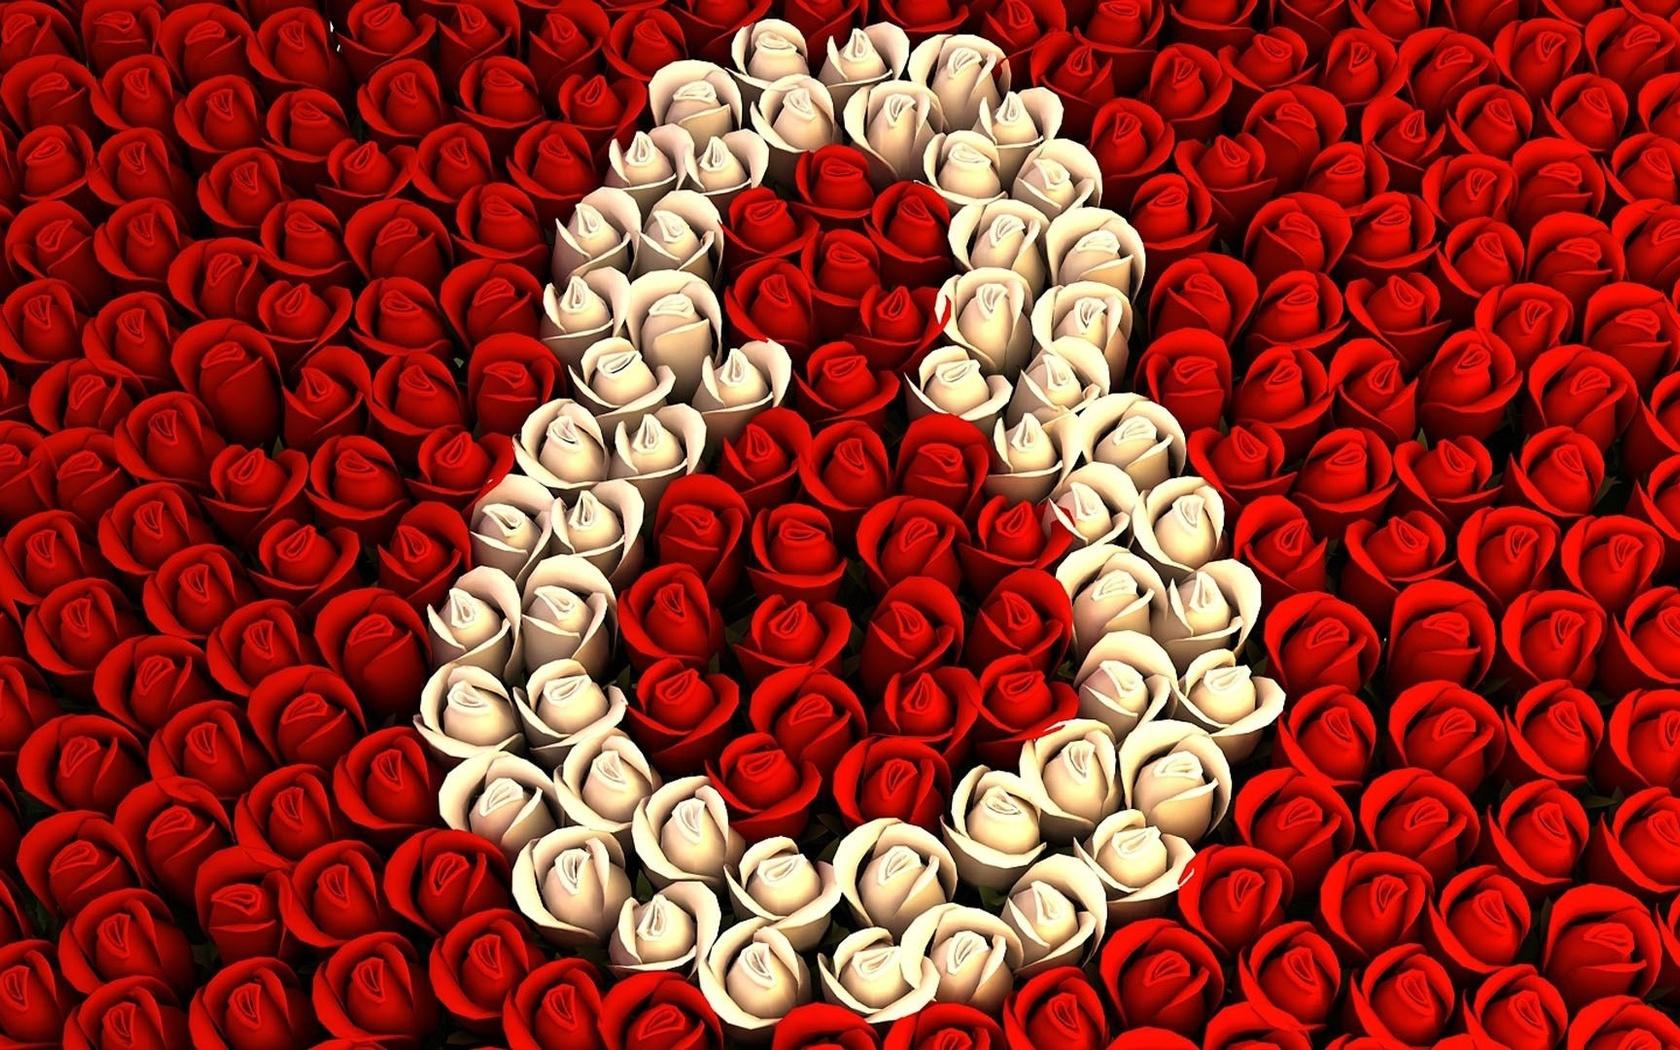 Мандарины, 8 марта картинки роза